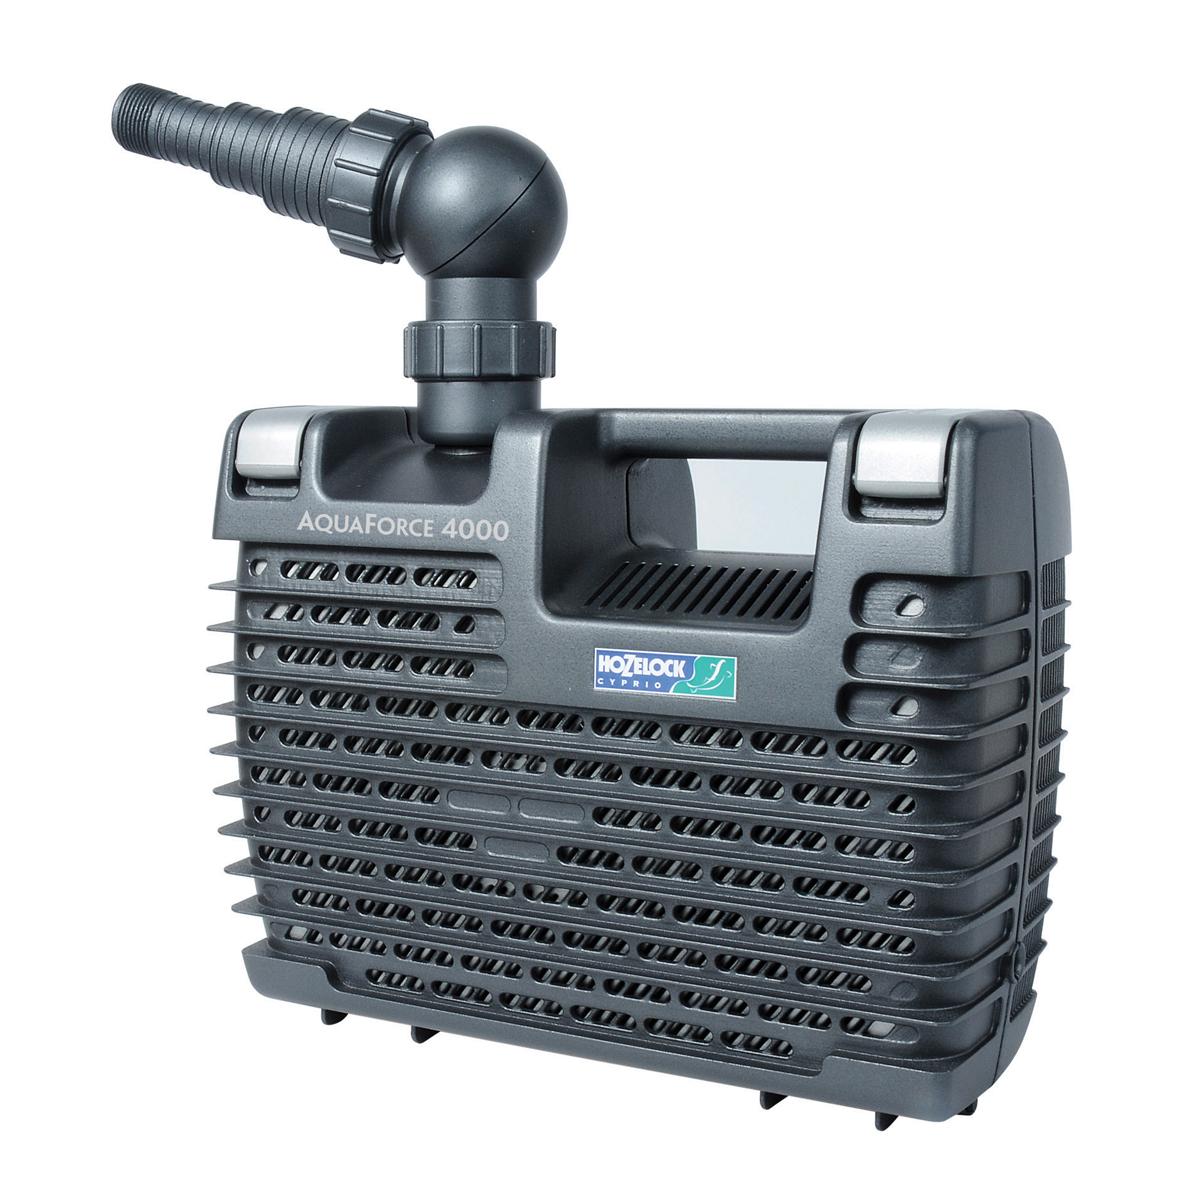 Hozelock aquaforce 4000 filter pump koi fish pond water for Coy pond pump